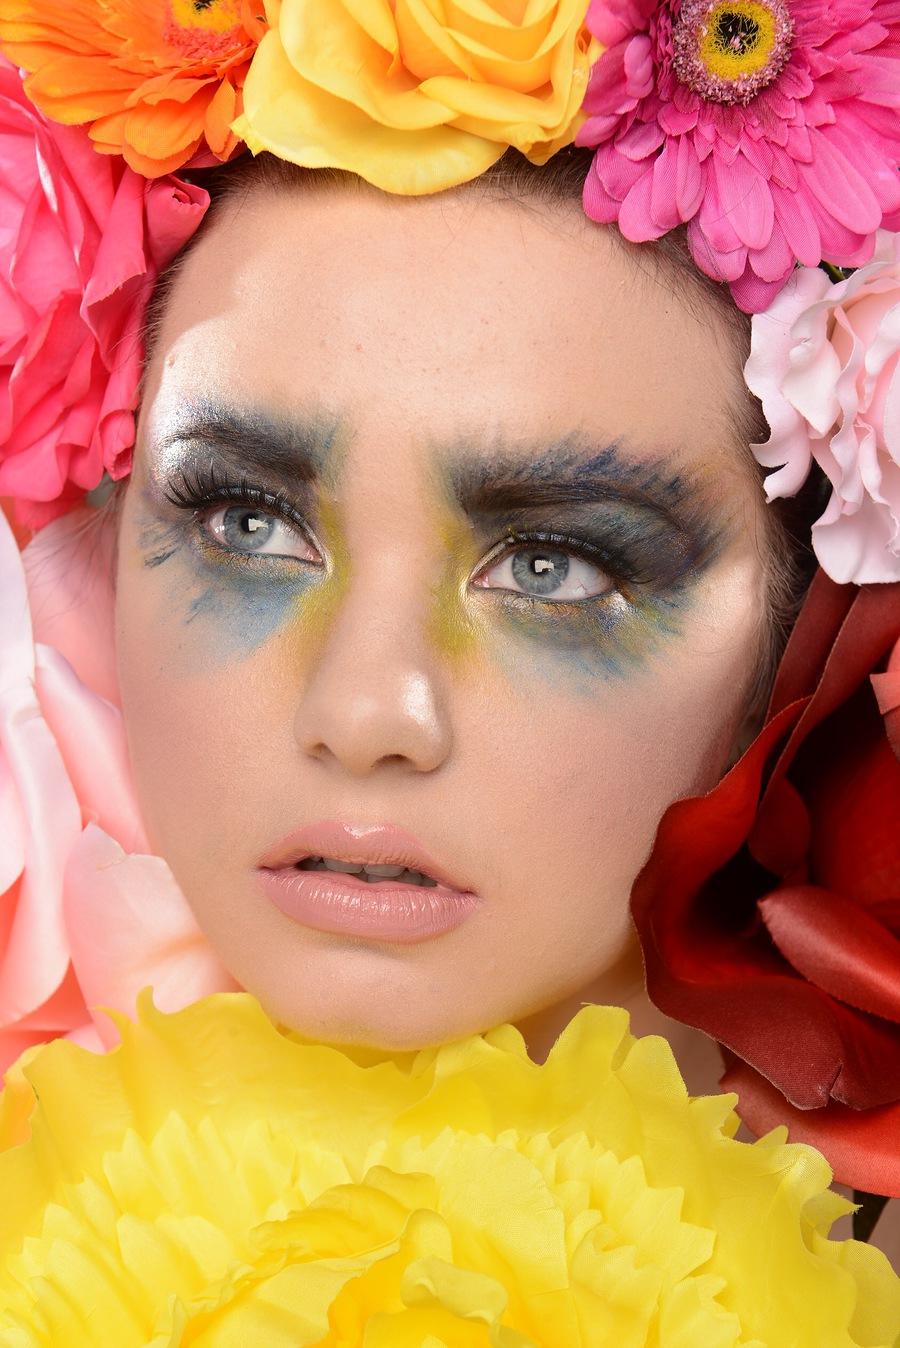 Flowers / Model HannahMG, Stylist HannahMG / Uploaded 8th November 2015 @ 04:03 PM